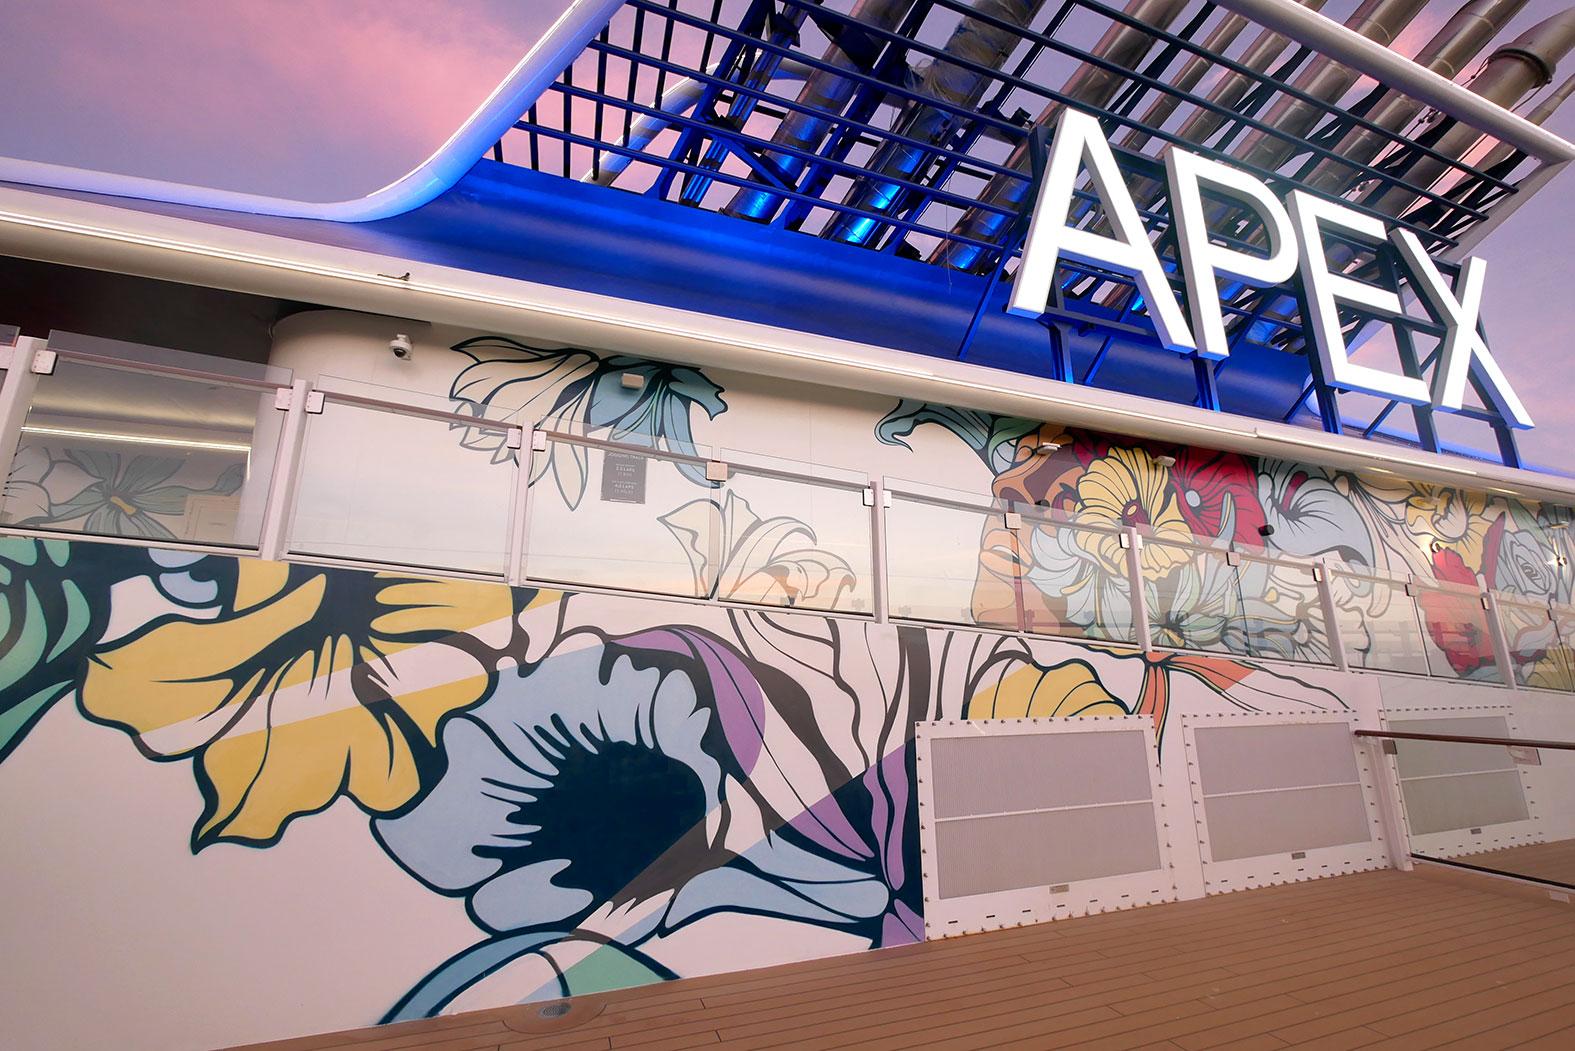 Nerone-apex-celebrity-cruises-18